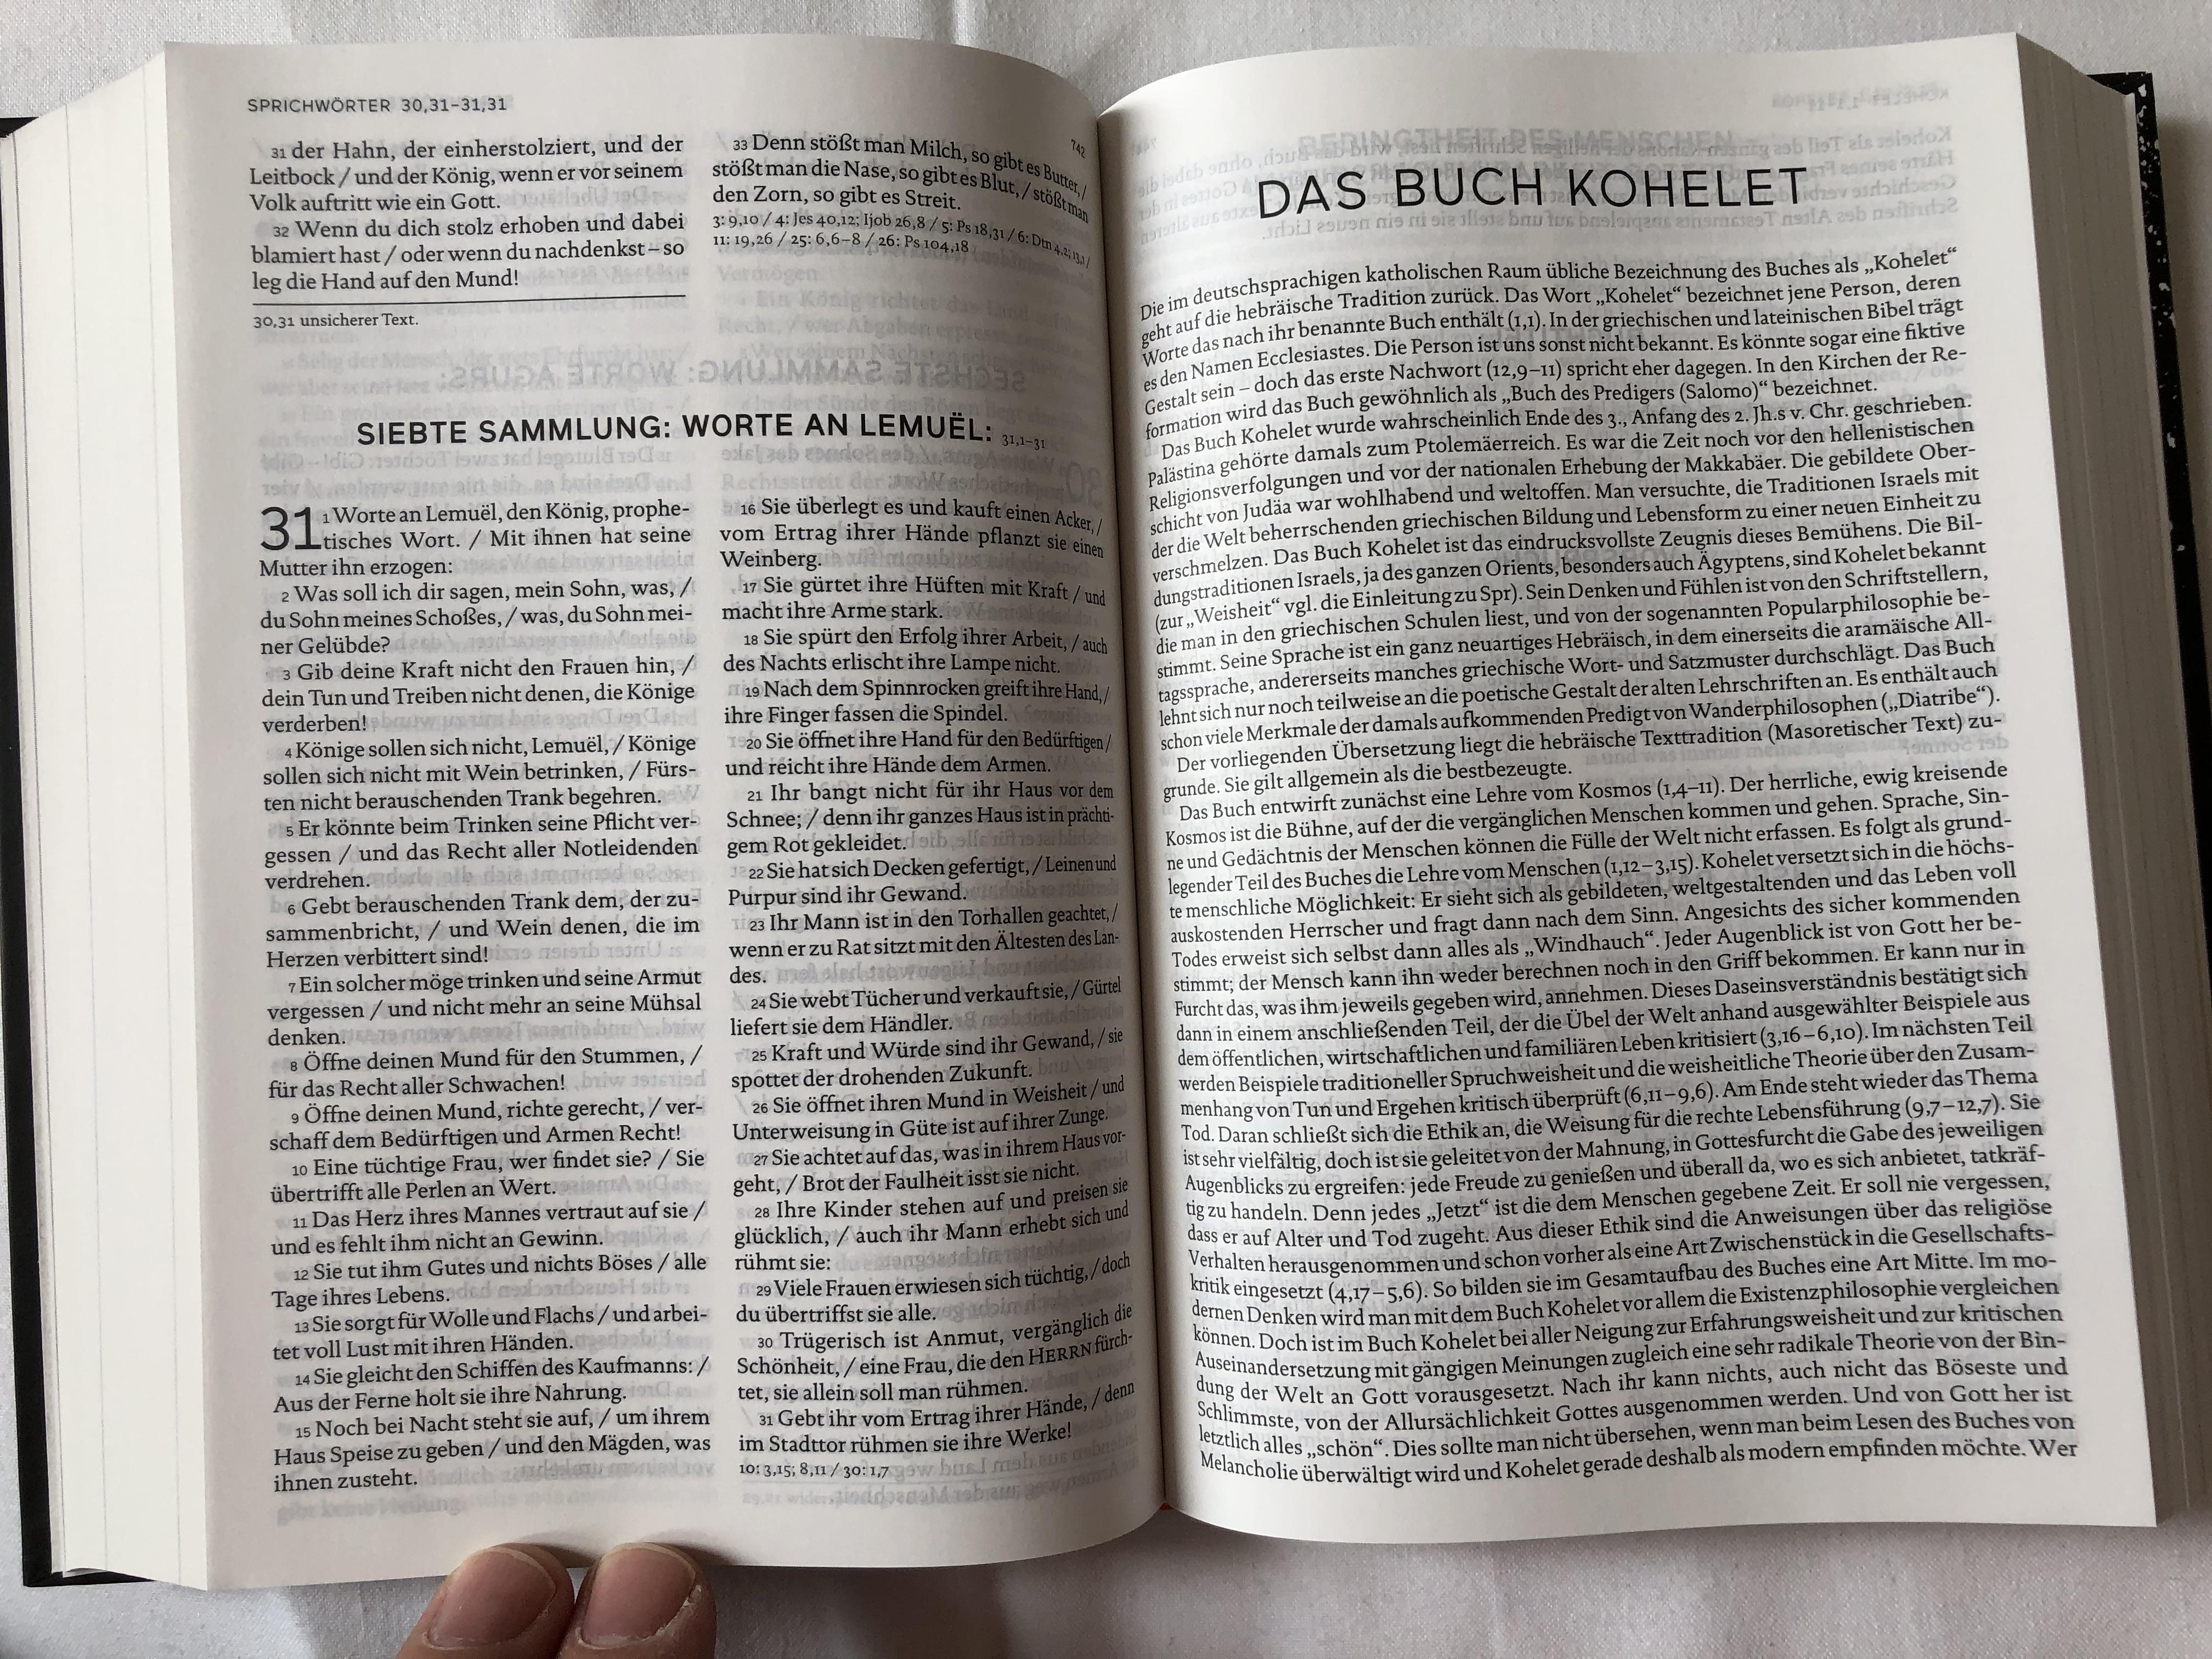 die-bibel-einheits-bersetzung-german-language-holy-bible-unitary-translation-contains-deuterocanonical-books-apocrypha-hardcover-2016-kbw-10-.jpg